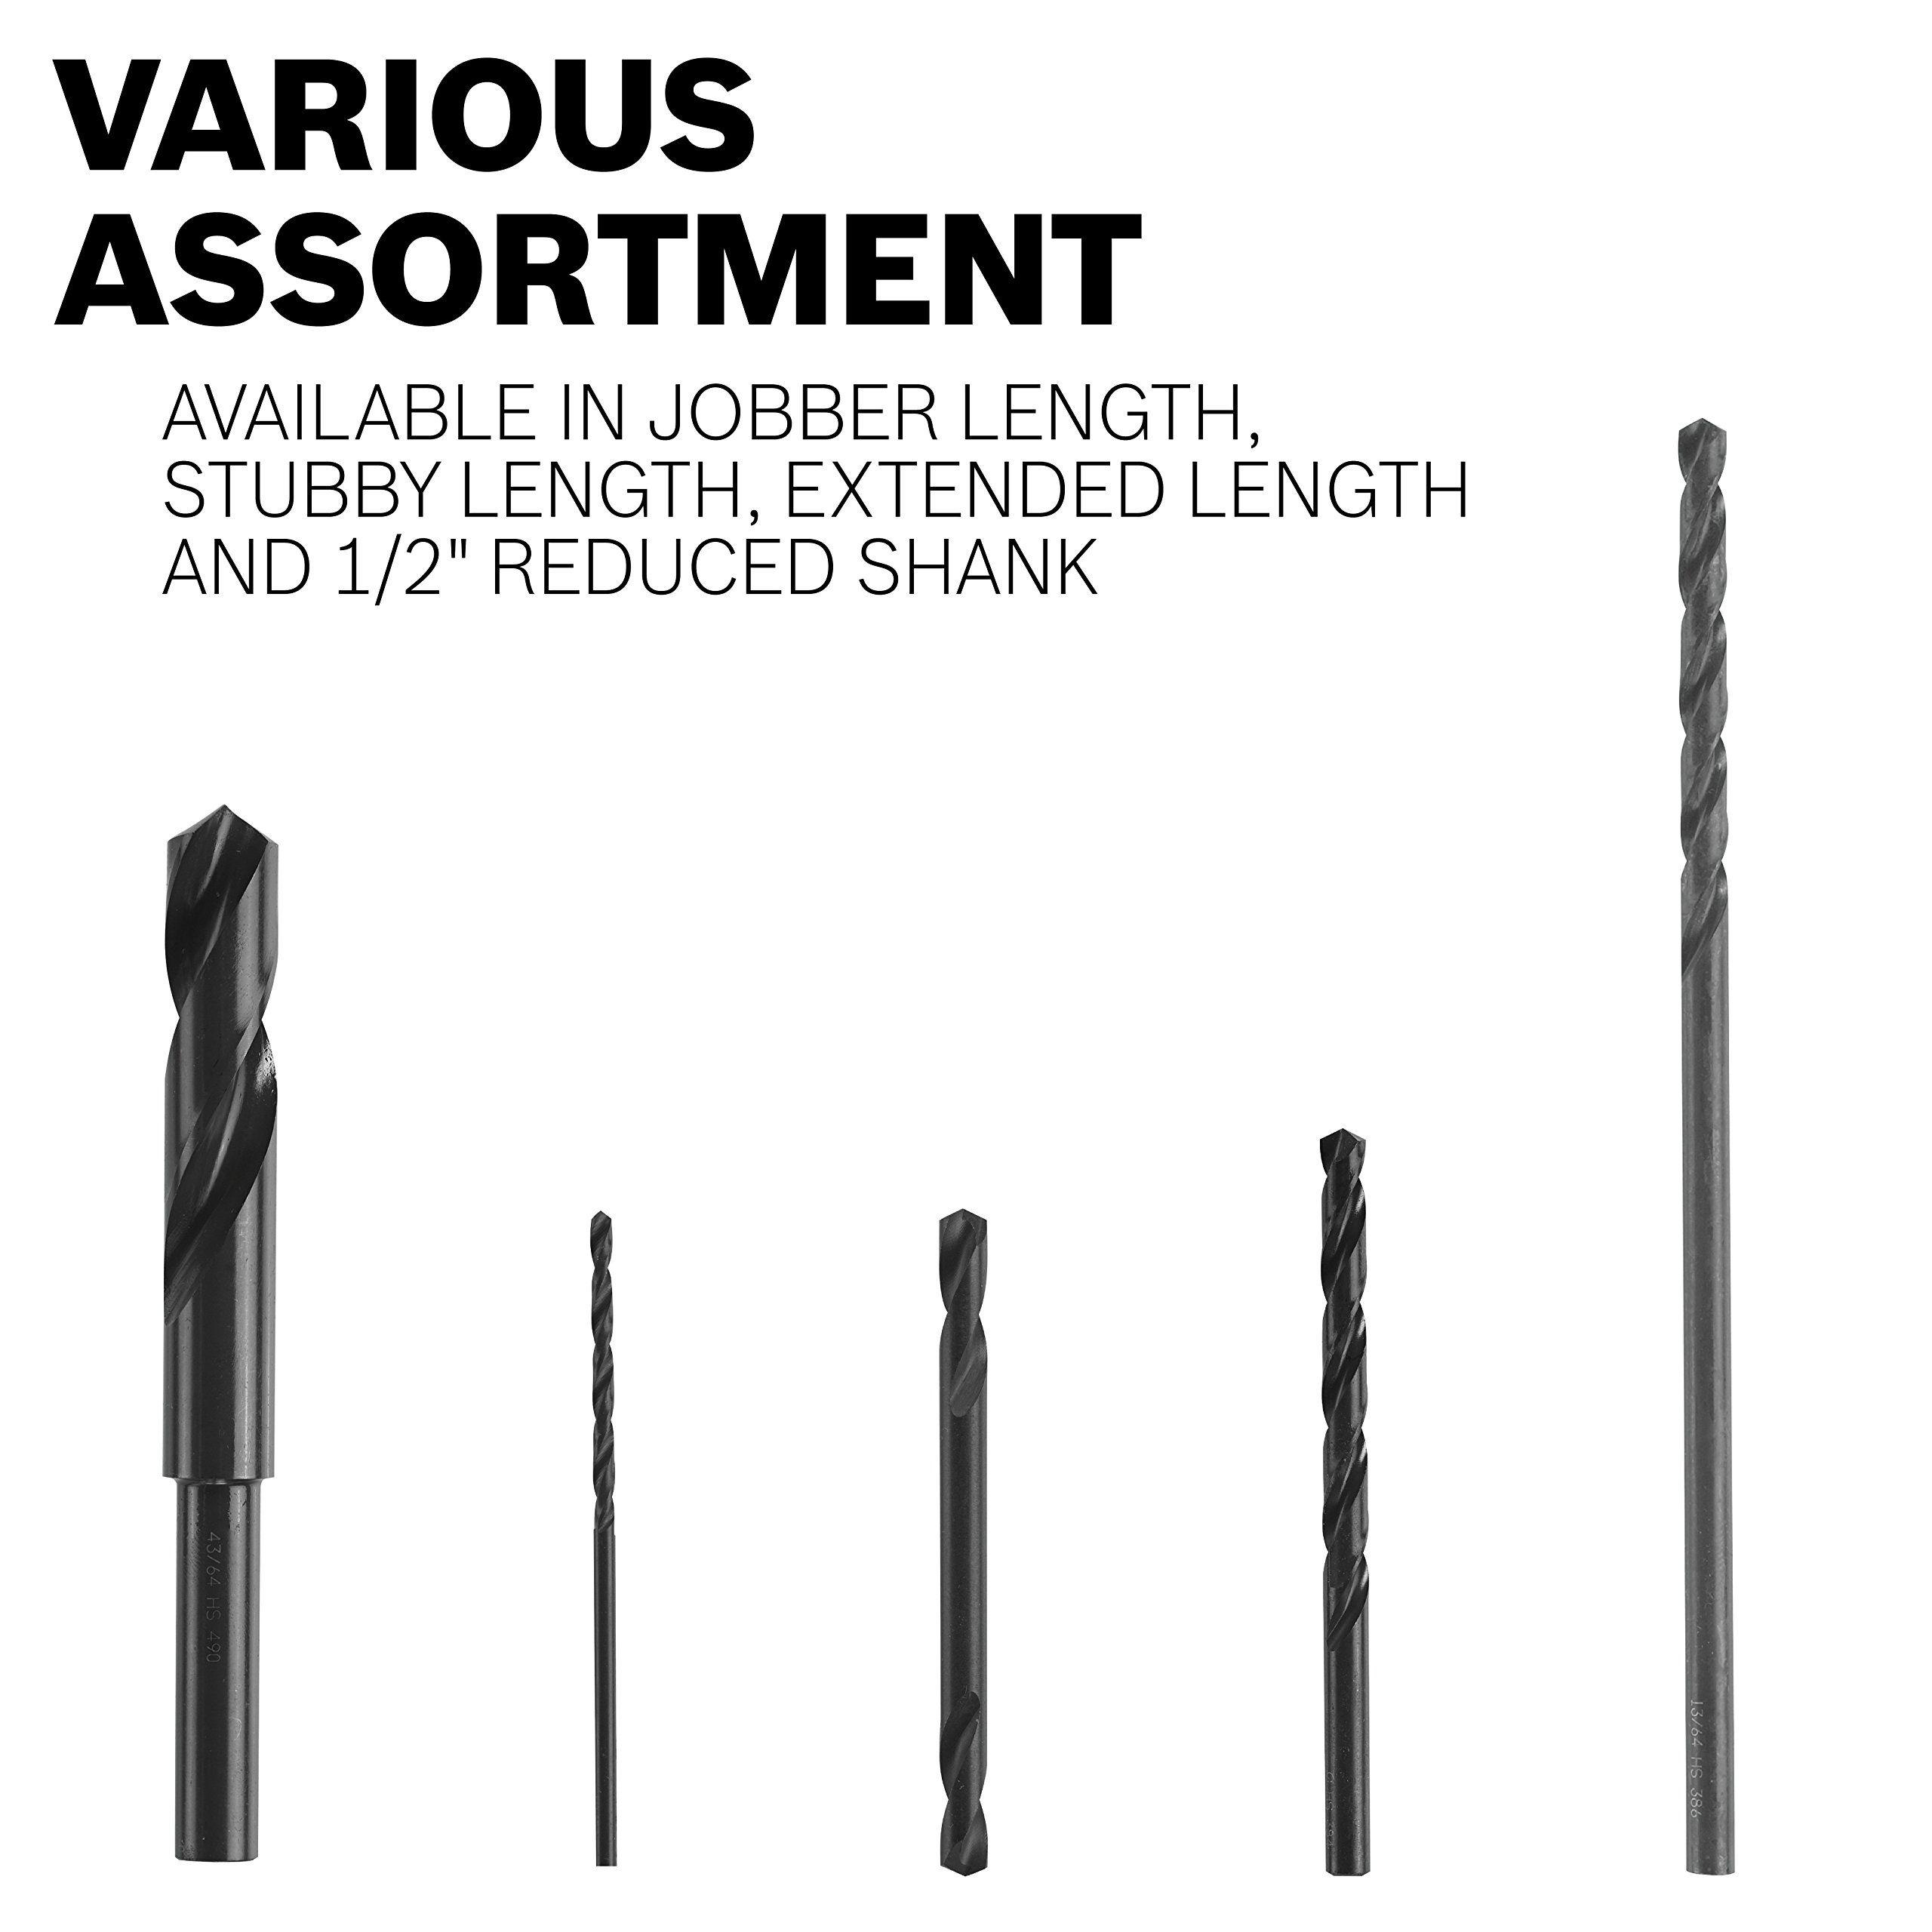 x 6 In Fractional Reduced Shank Black Oxide Drill Bit Bosch BL2171 11//16 In